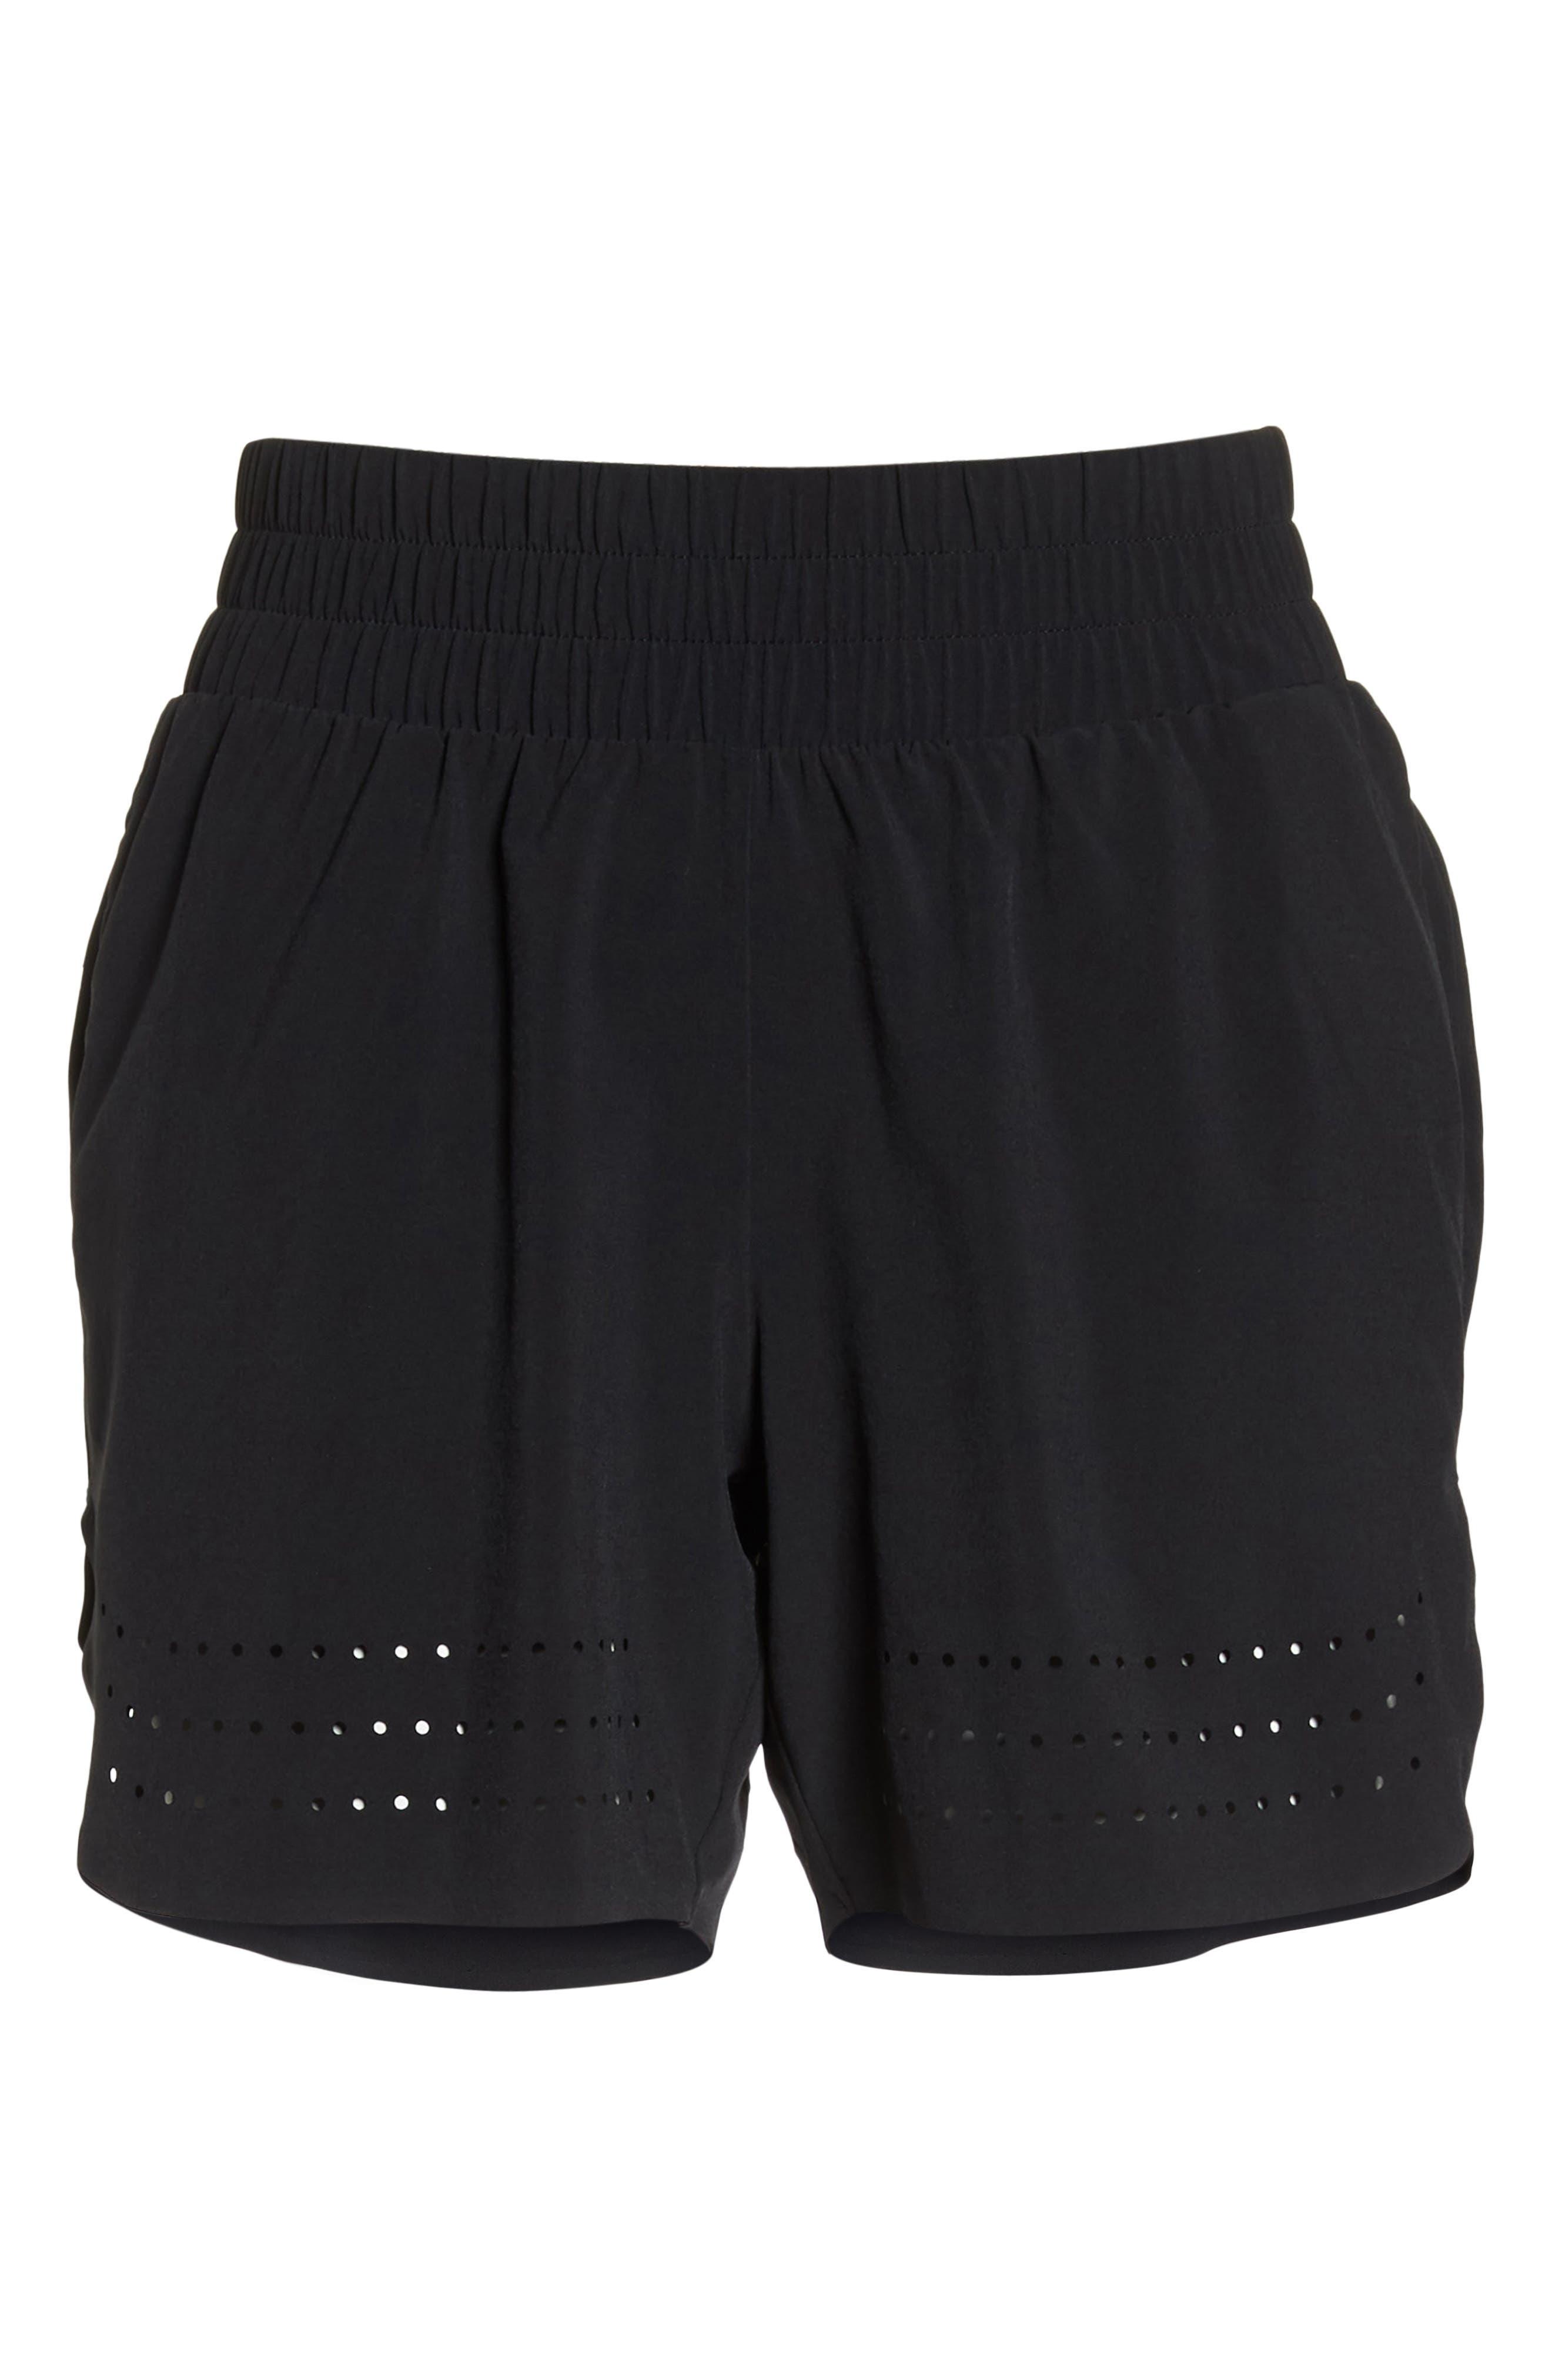 Hoop Shorts,                             Alternate thumbnail 7, color,                             BLACK